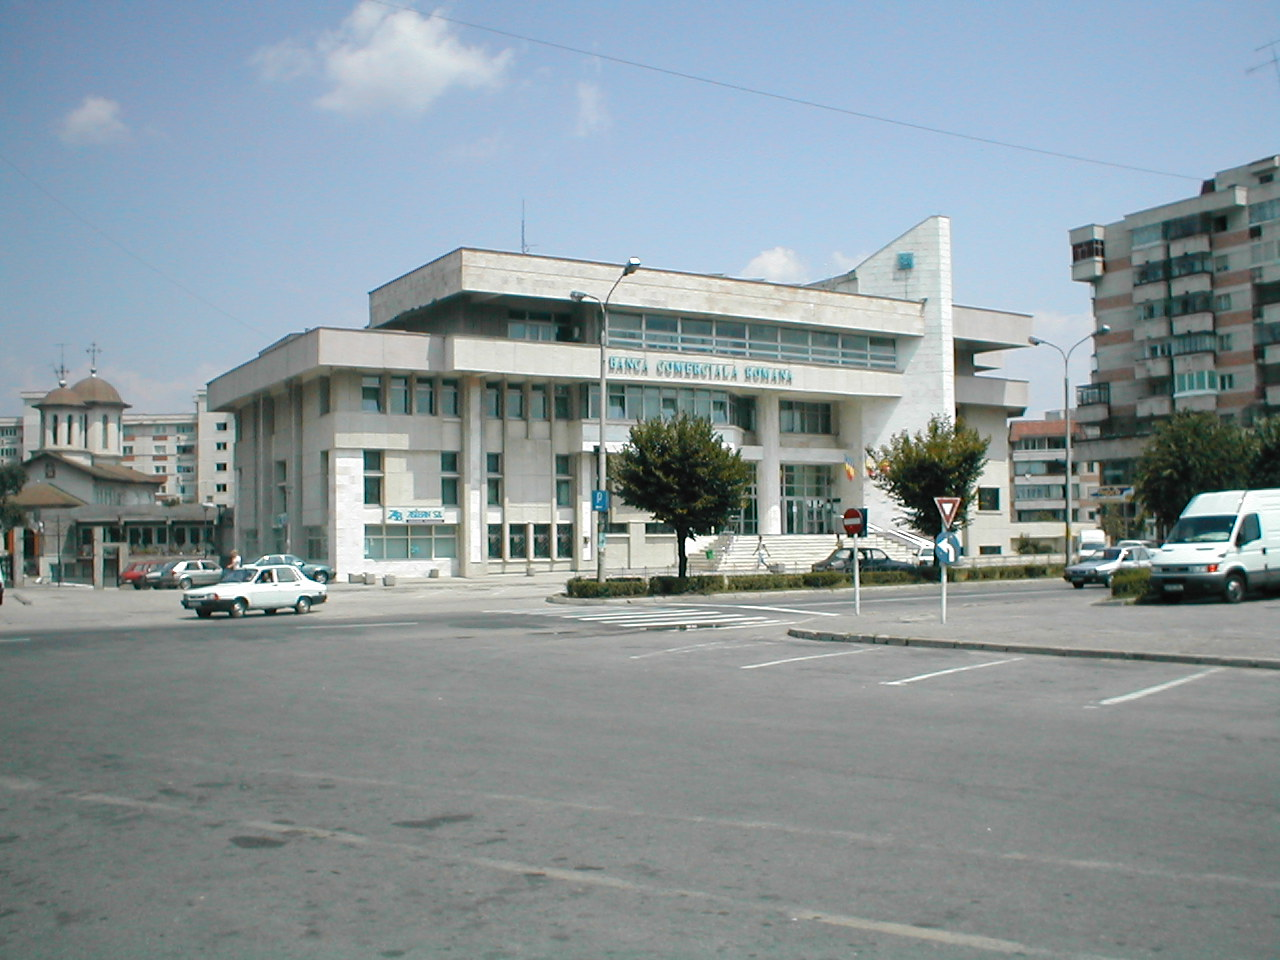 Banca comerciala romana pitesti - Faience imitatie leisteen ...